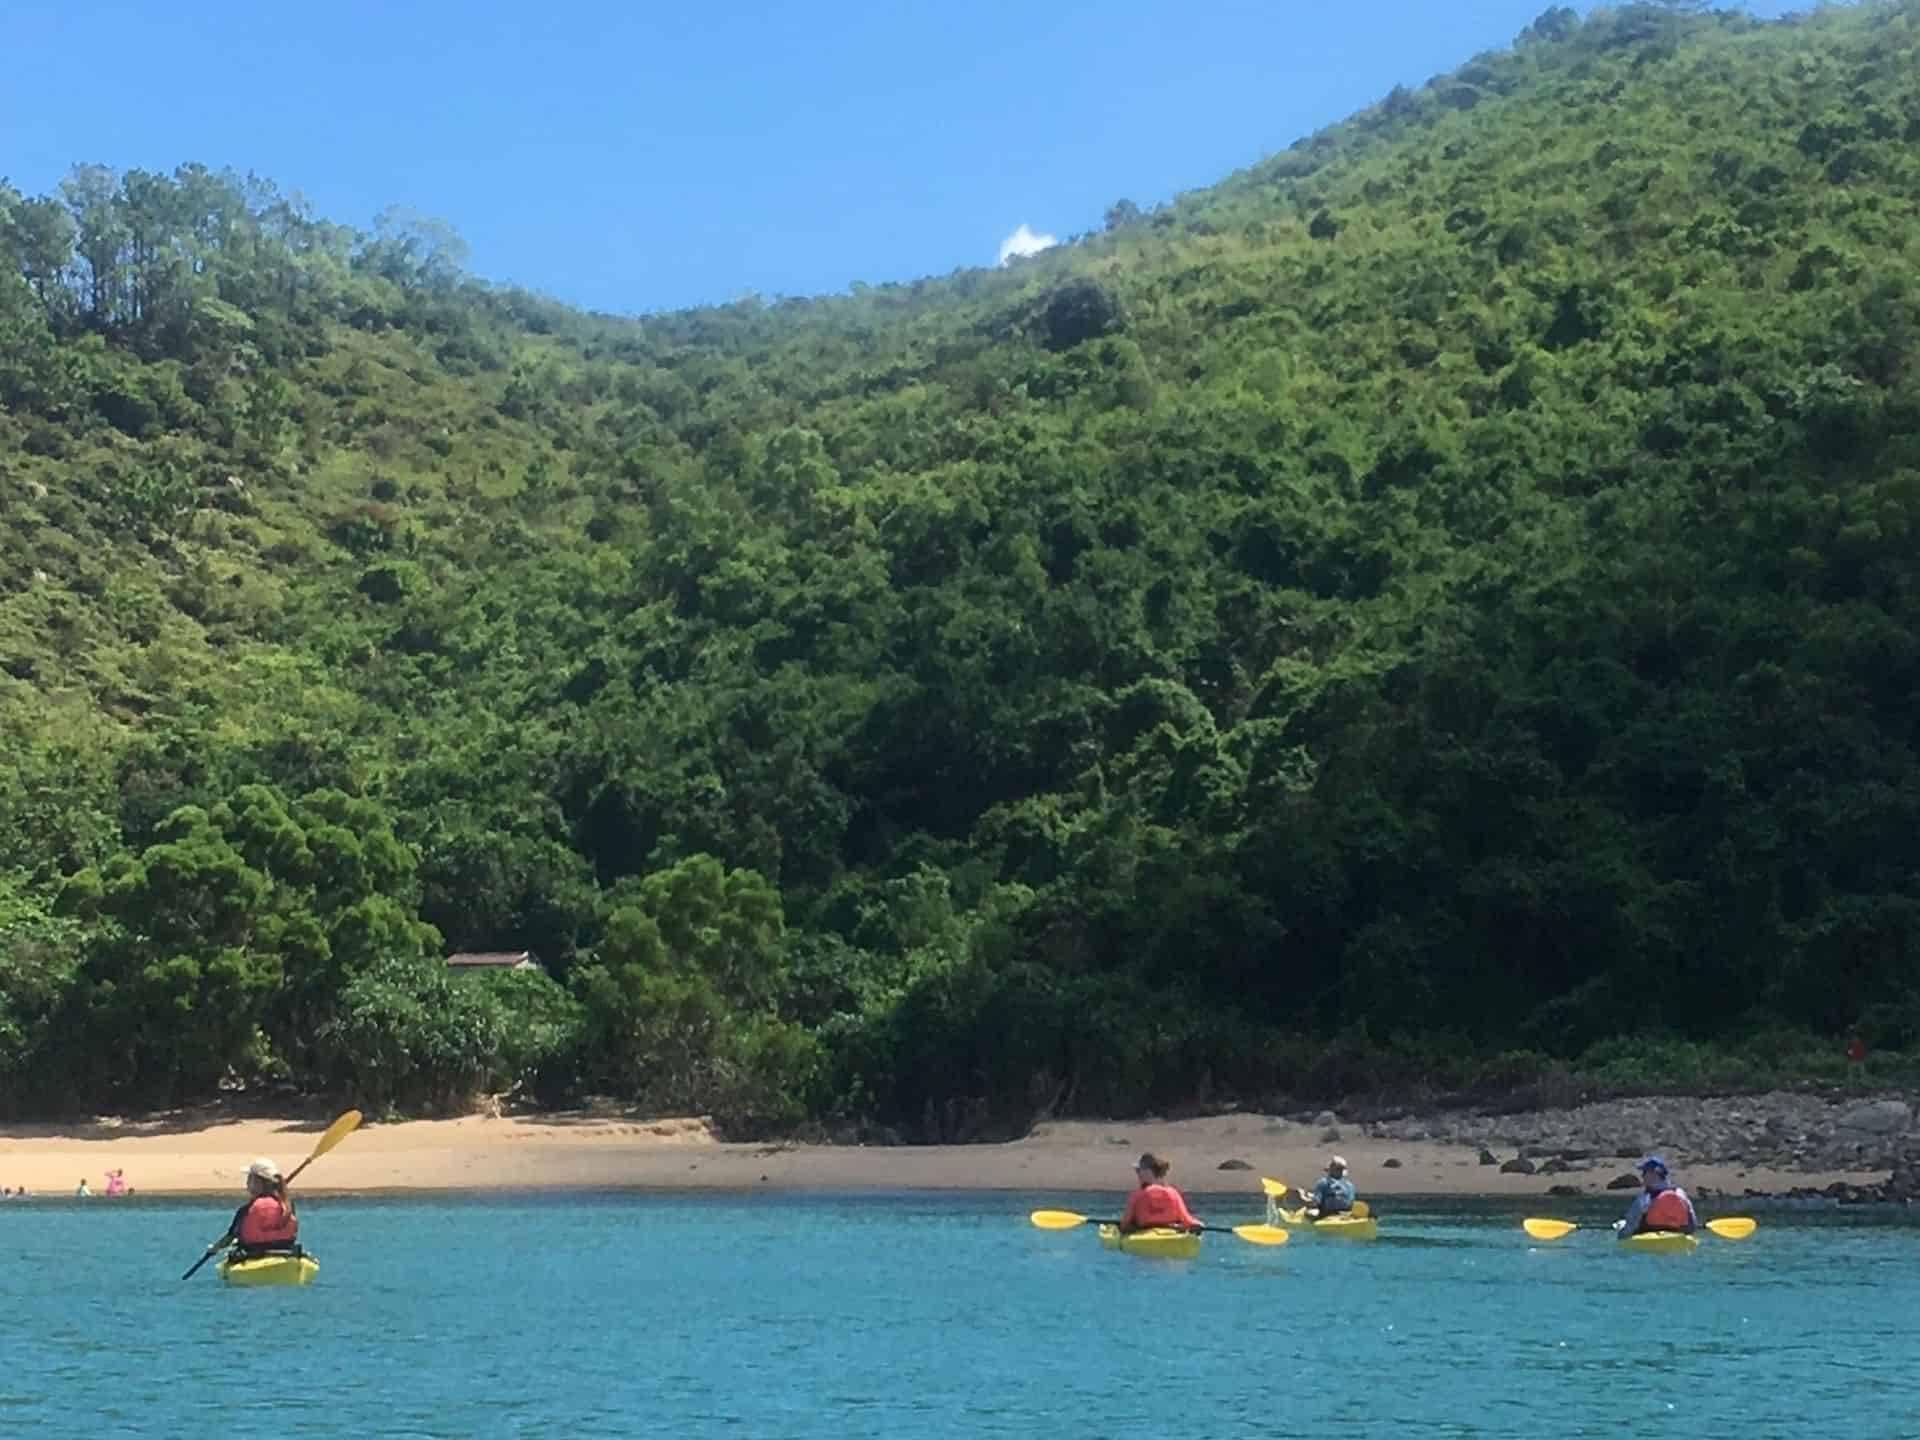 sea kayaking onHong Kong Island